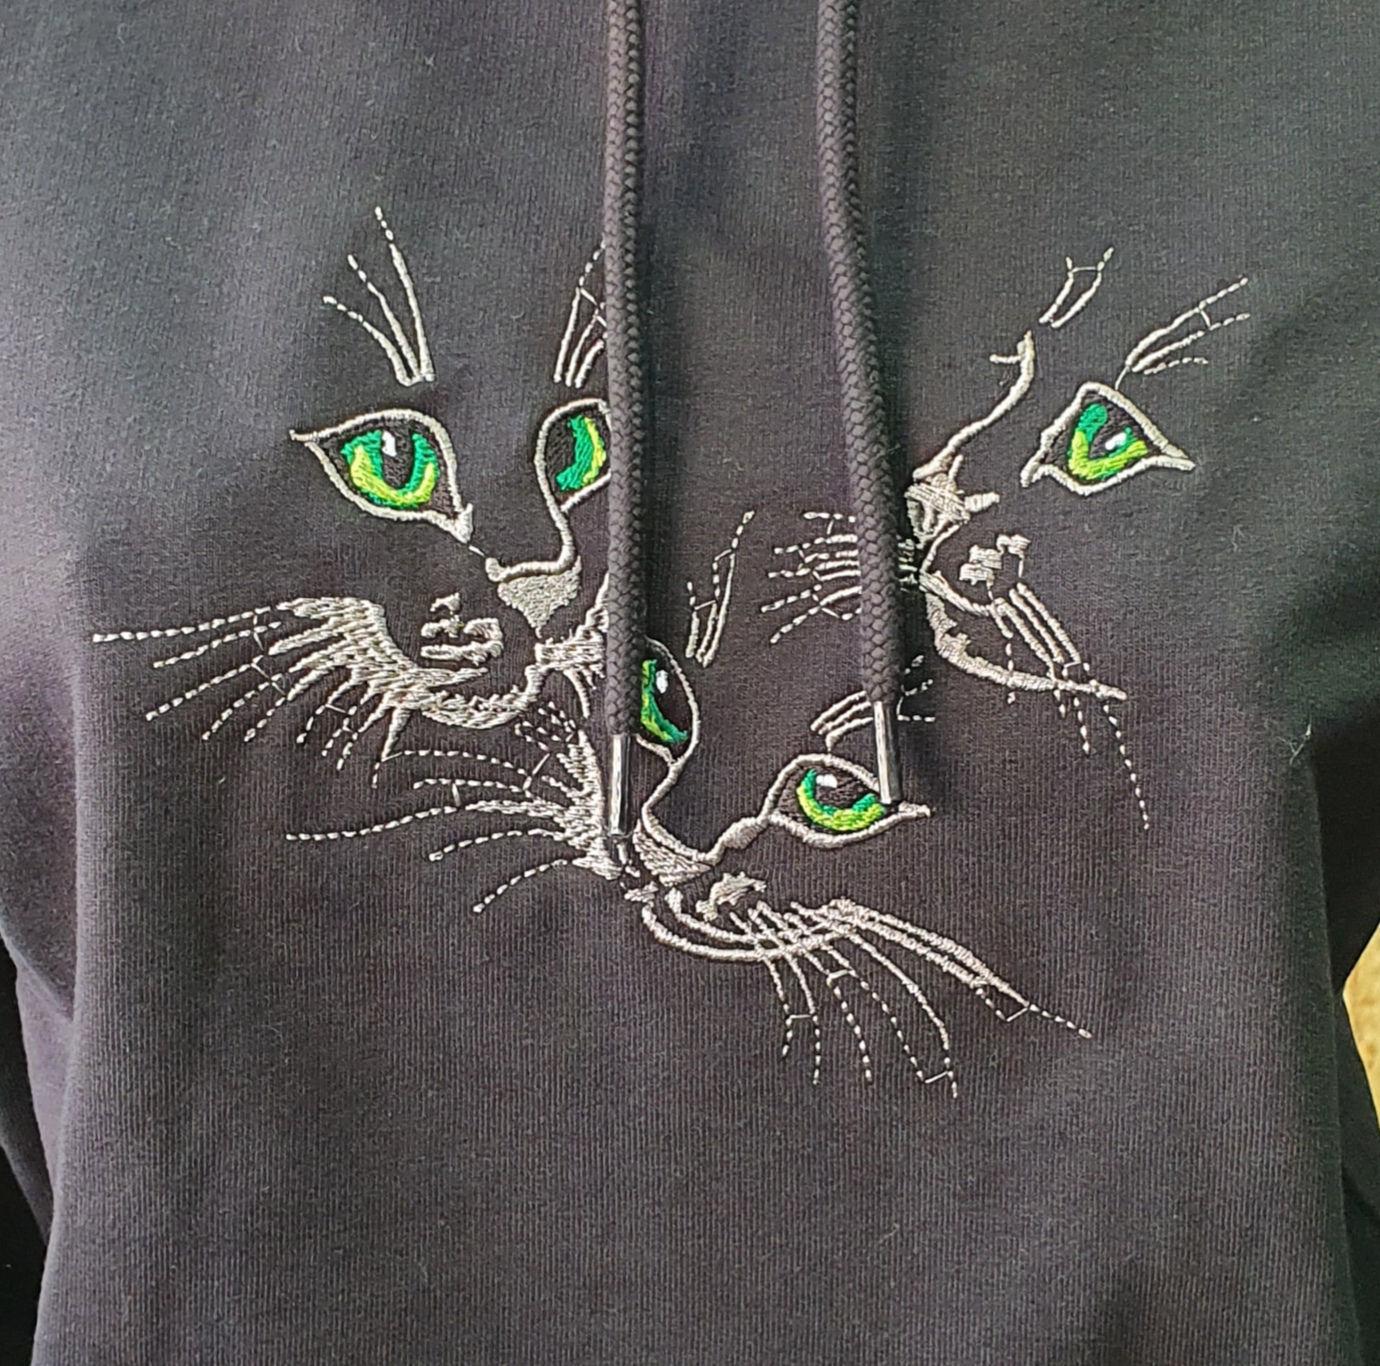 Poza cu Hanorac 3 Pisici